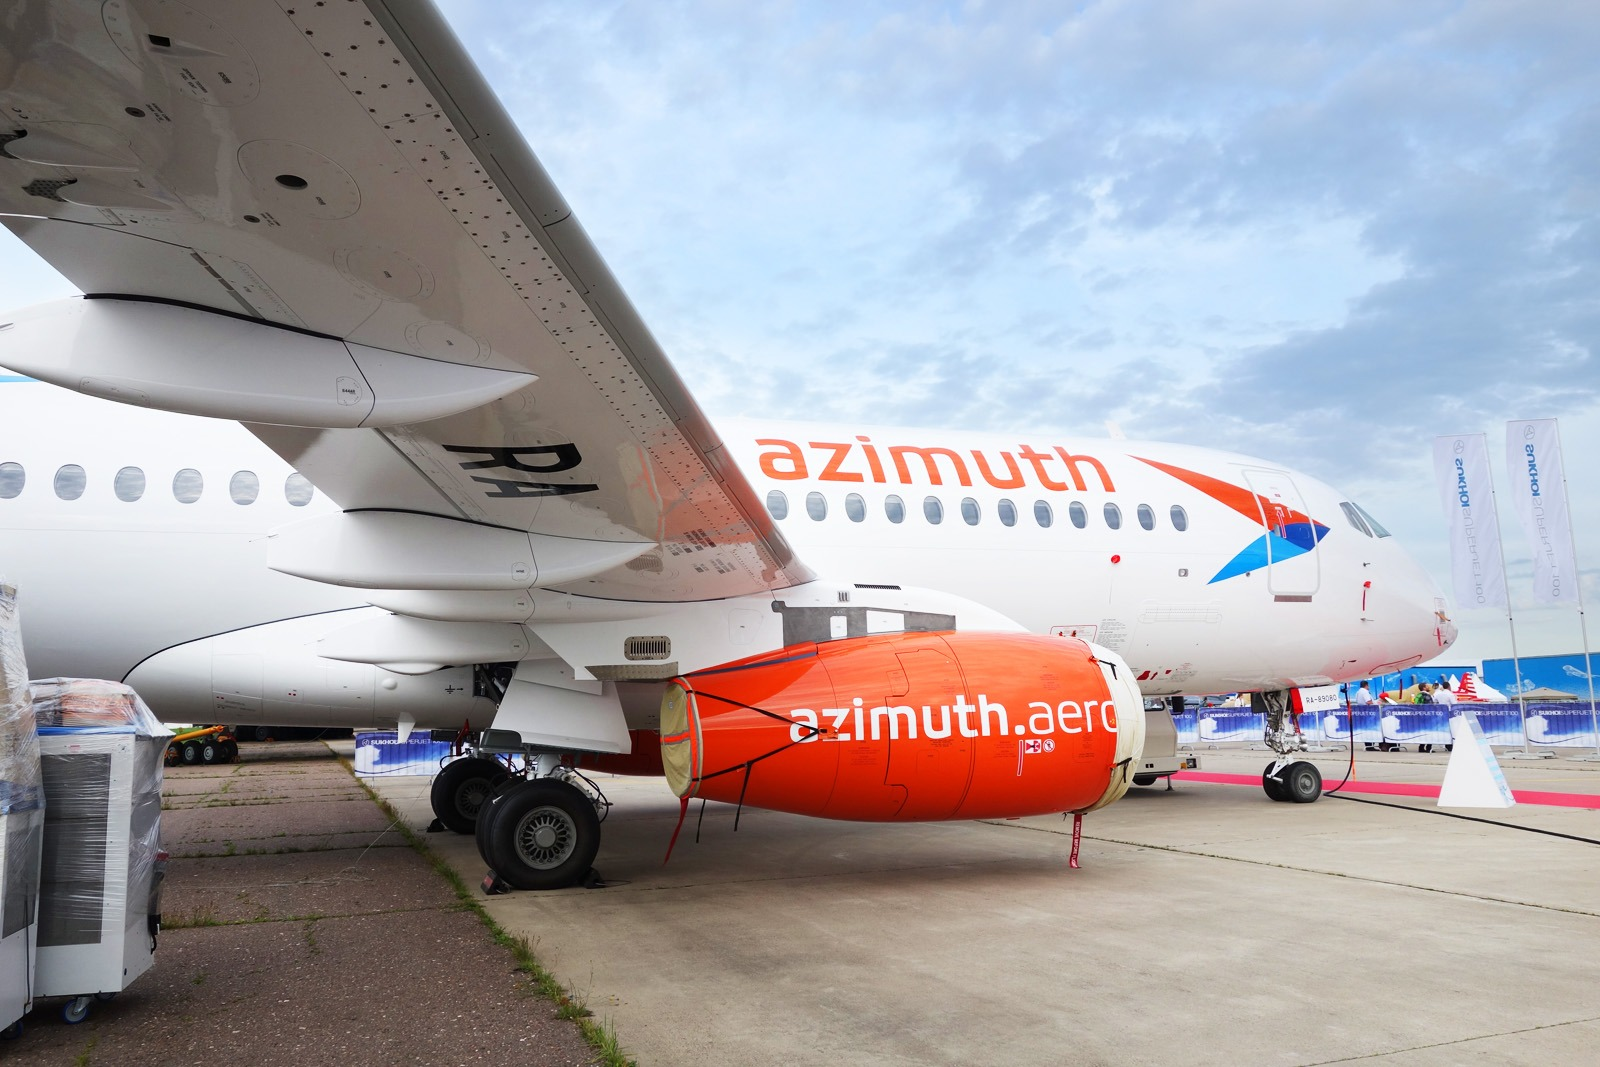 Дизайн ливреи самолета, брендинг авиакомпании Азимут, Asgard Branding